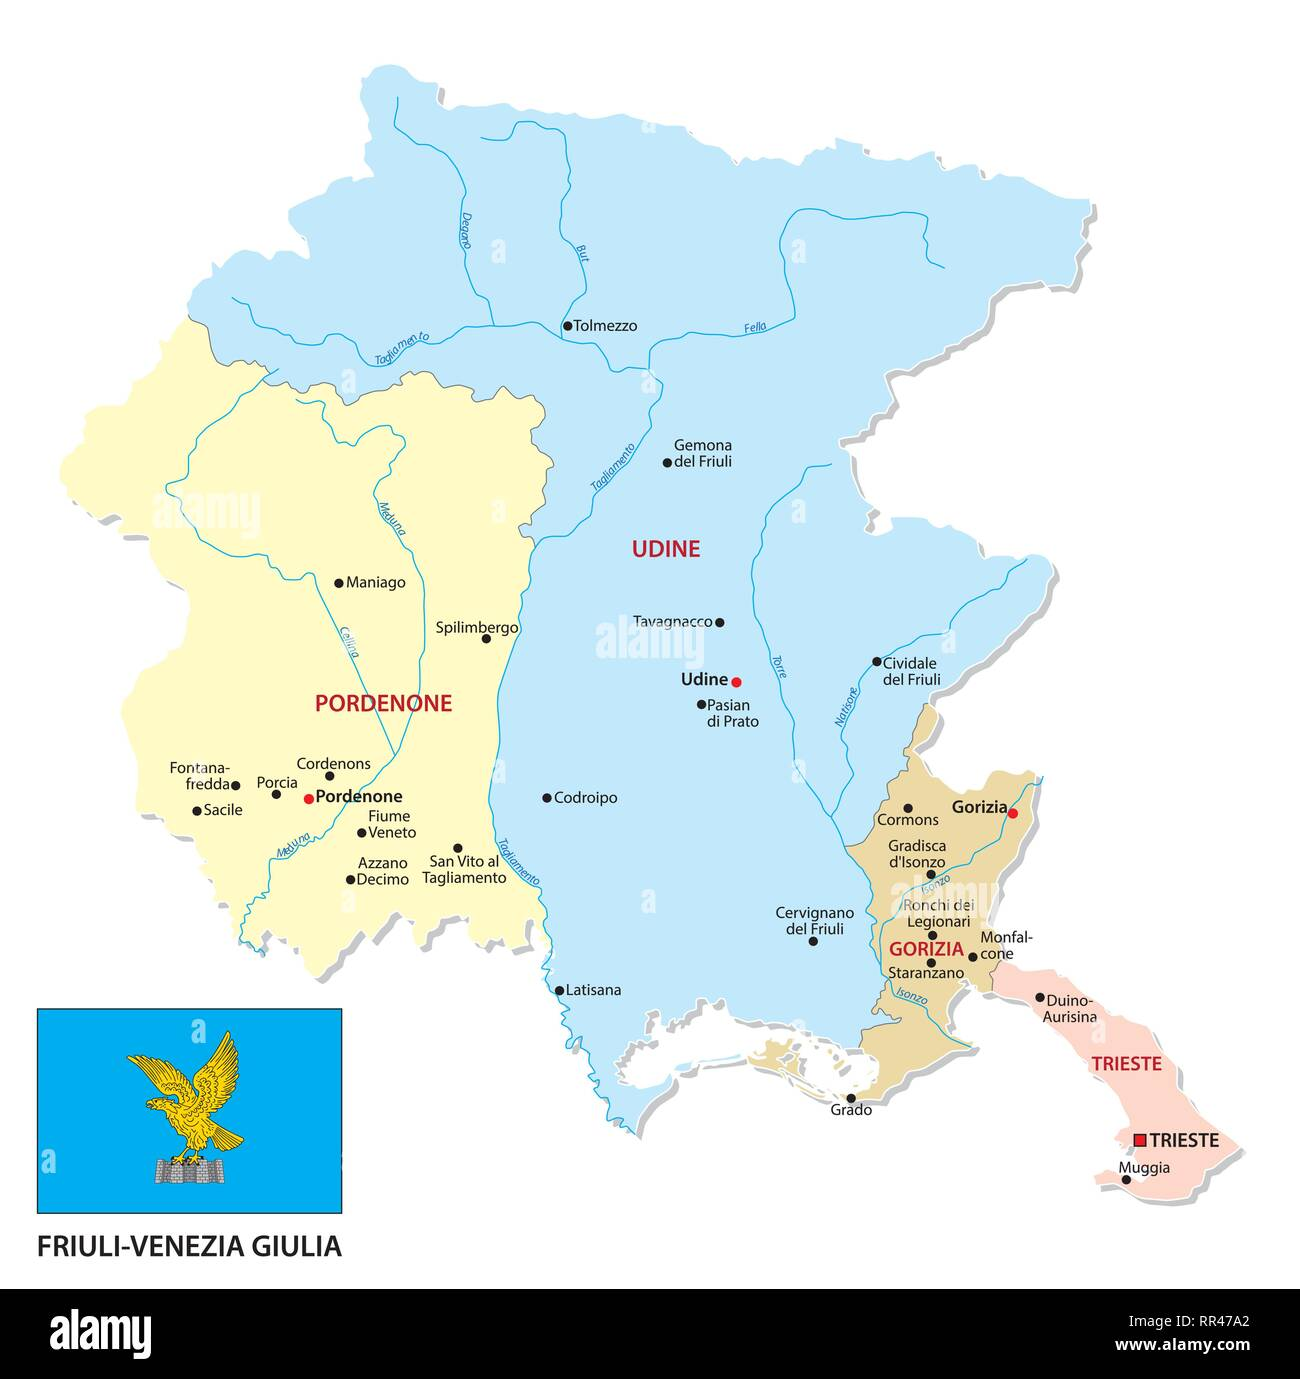 Cartina Friuli Venezia Giulia.Friuli Venezia Giulia Administrative And Political Map With Flag Stock Vector Image Art Alamy